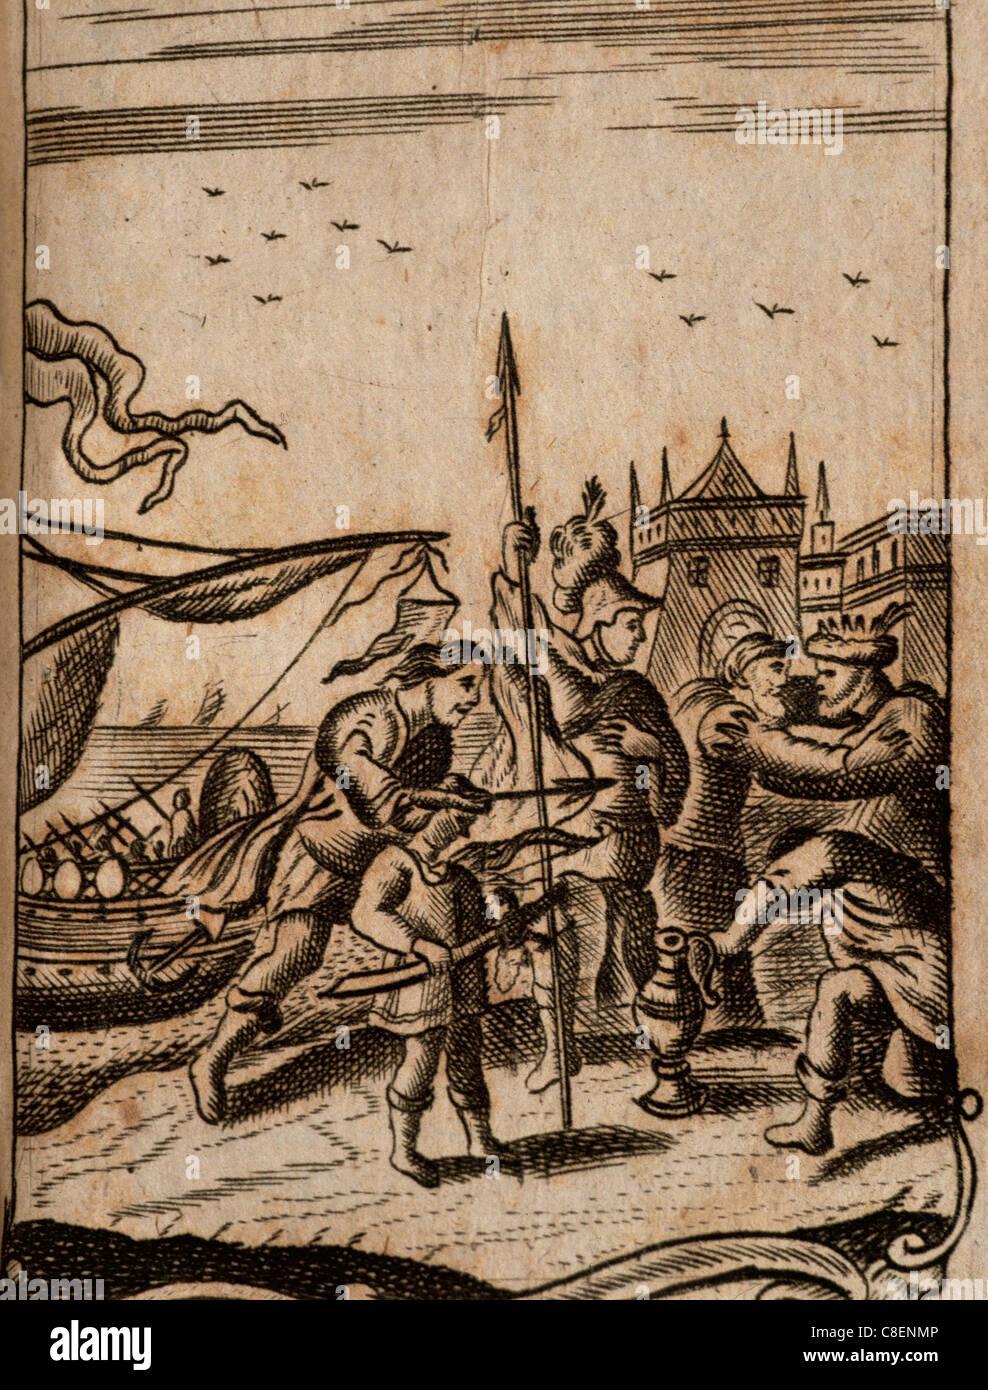 Publius Vergilius Maro (70 BC-19 AC). Poète latin. Énéide. La gravure. 1729. Photo Stock